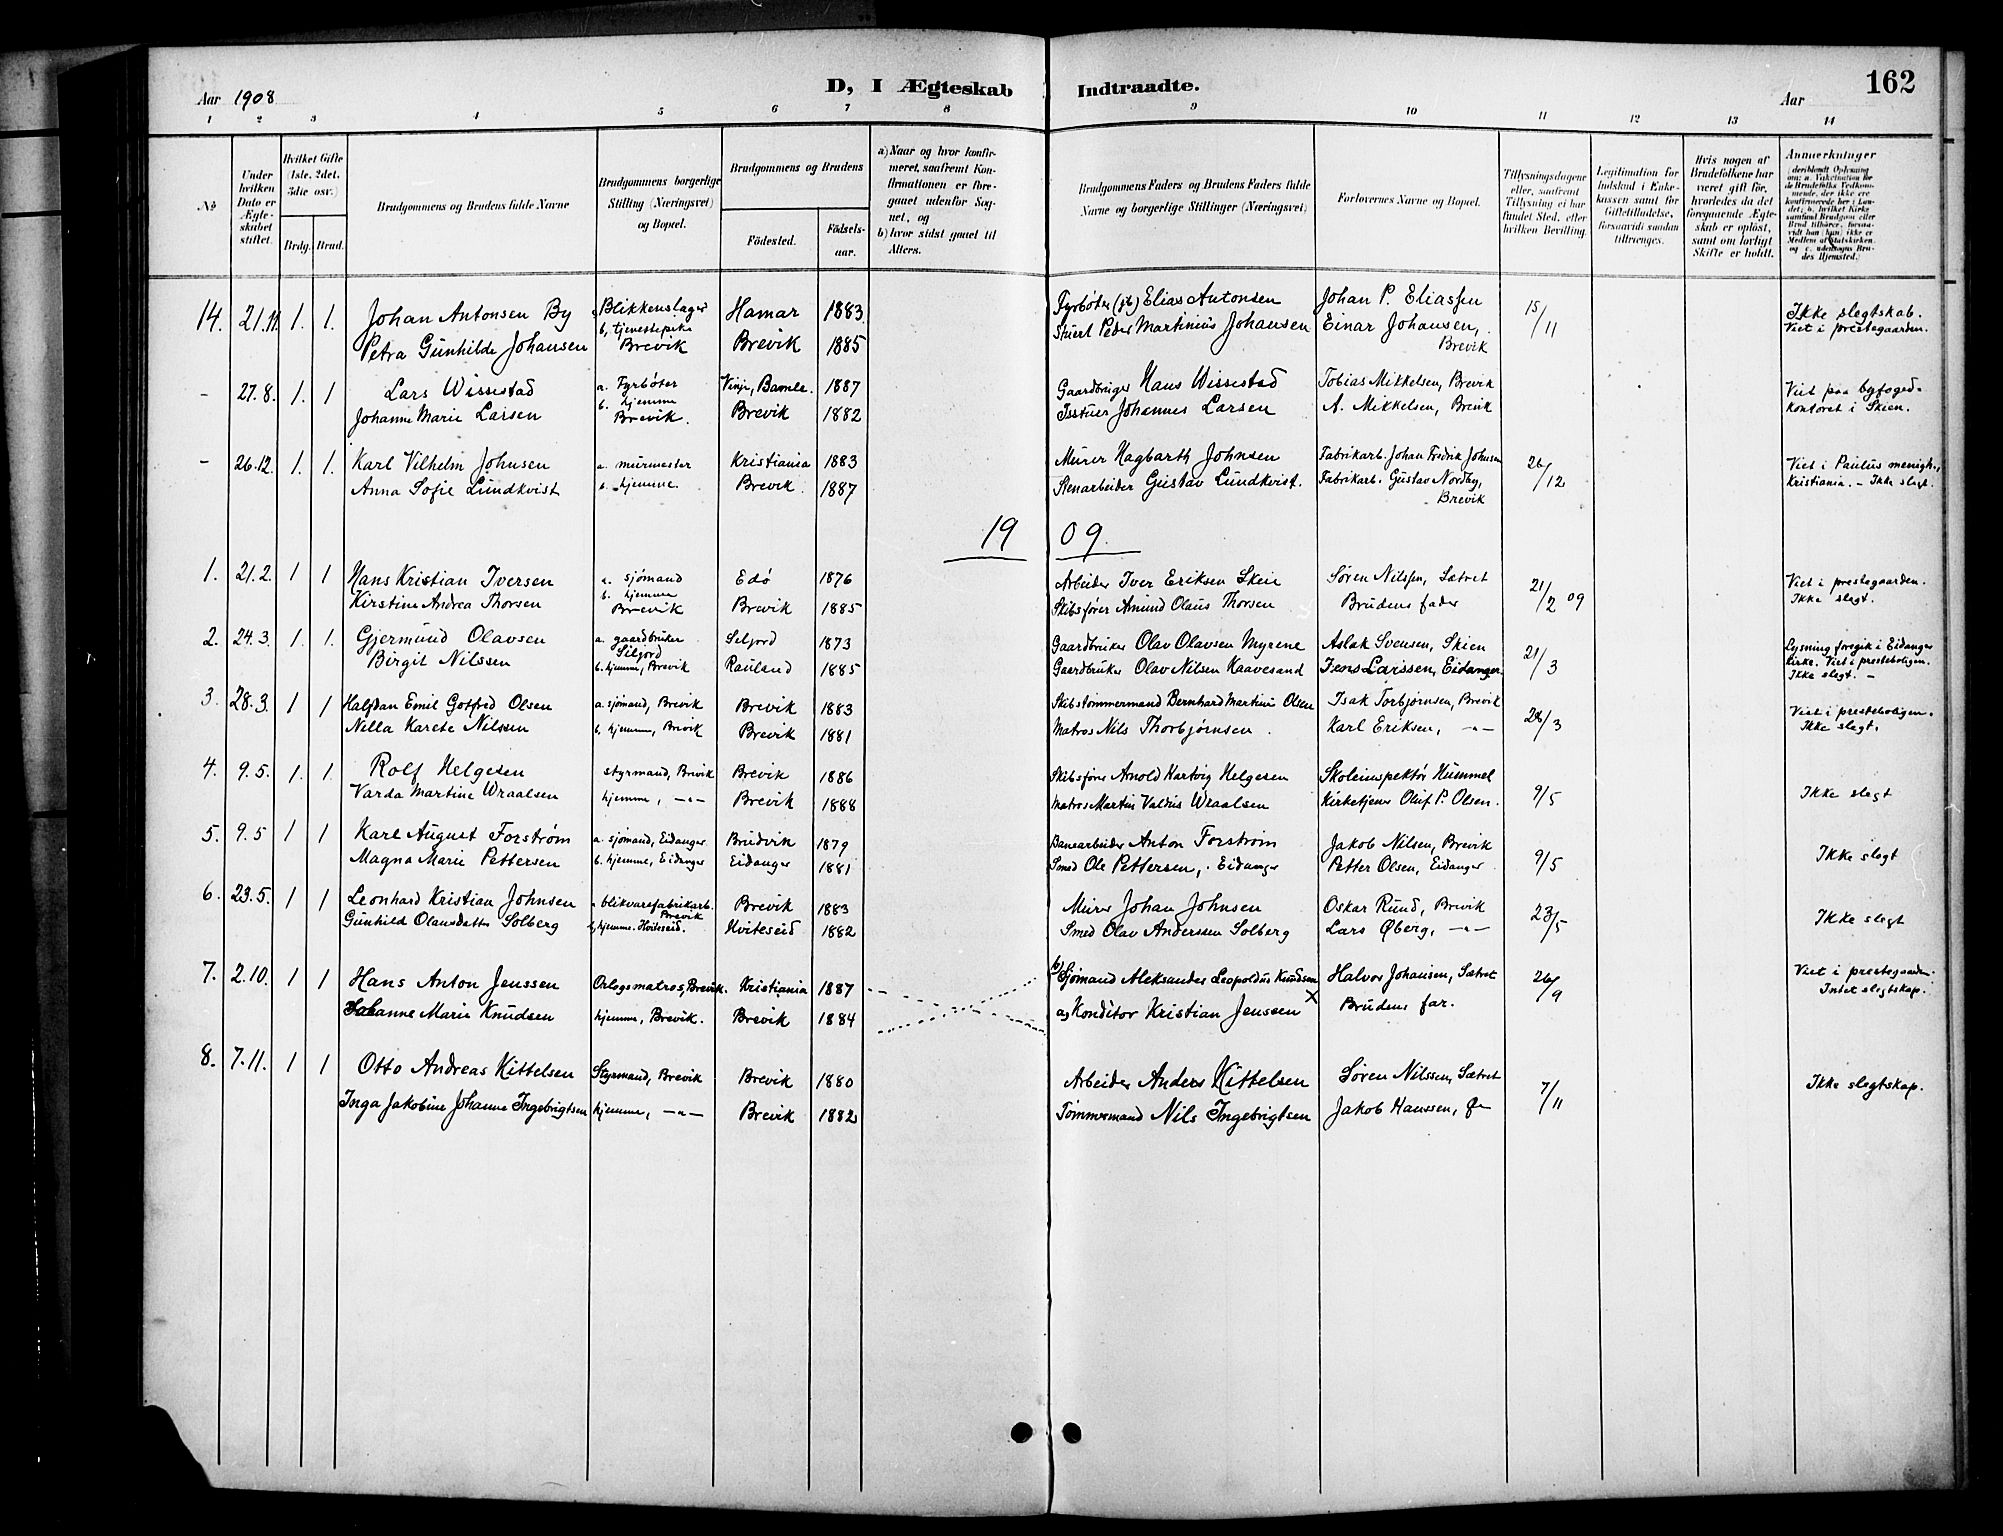 SAKO, Brevik kirkebøker, G/Ga/L0005: Klokkerbok nr. 5, 1901-1924, s. 162